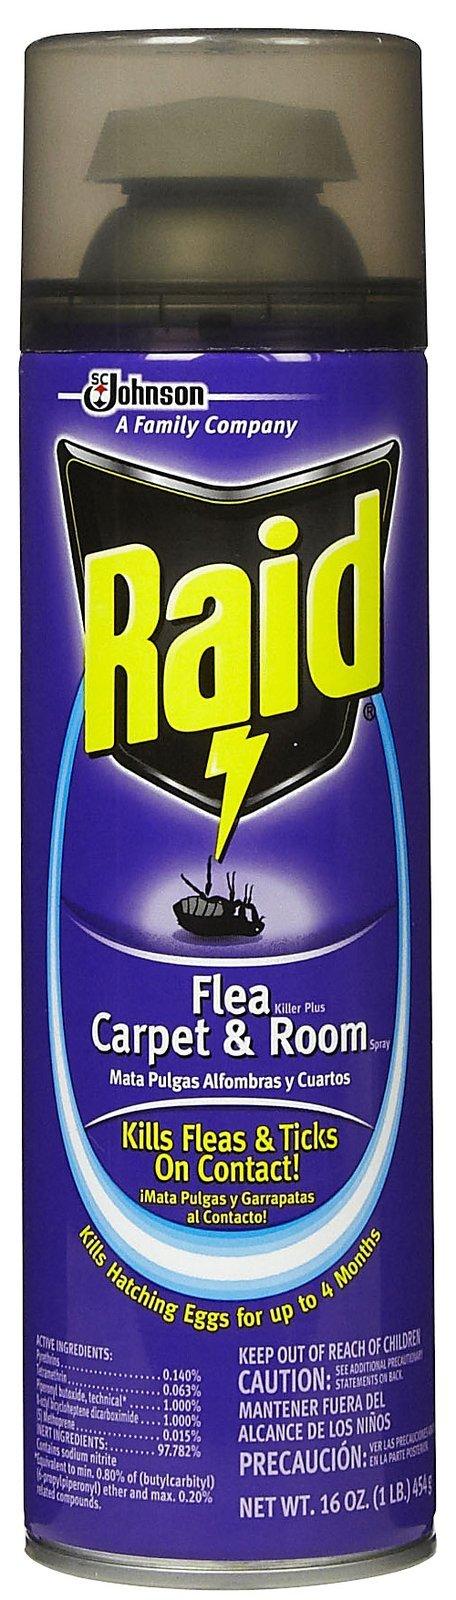 Raid Flea Killer Plus, Carpet and Room Spray-16 oz.